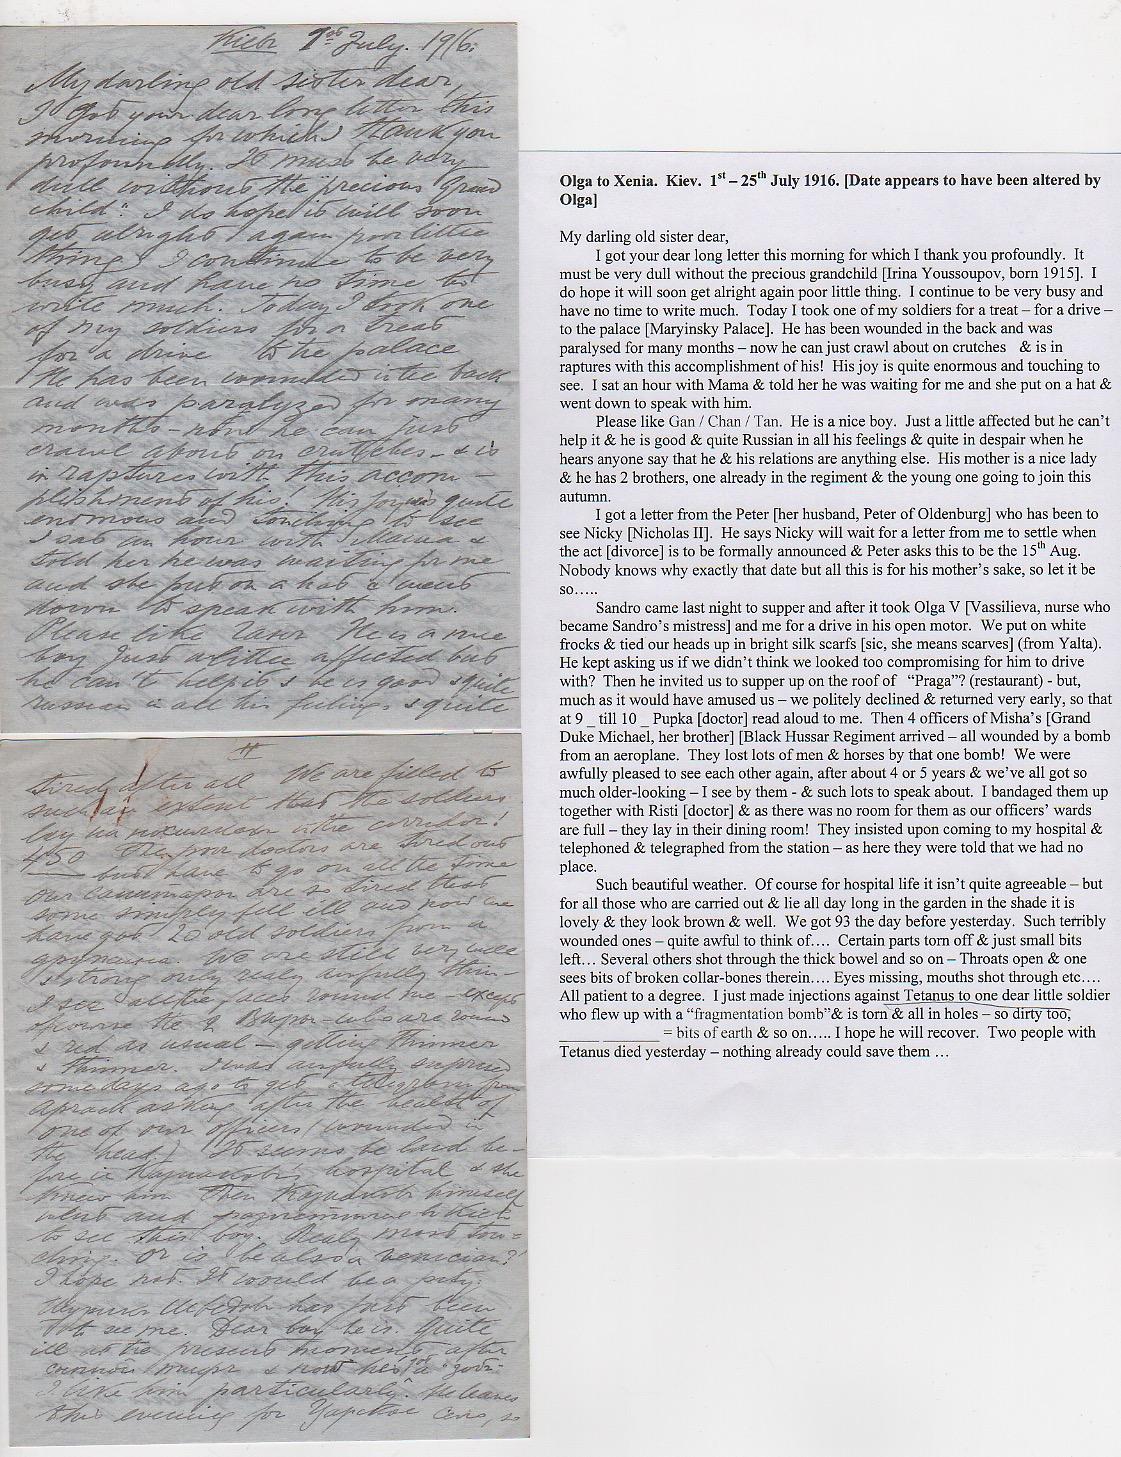 Royalty Grand Duchess Olga Correspondence To Her Sister Grand Duchess Xenia 1916-1920 - Image 30 of 47